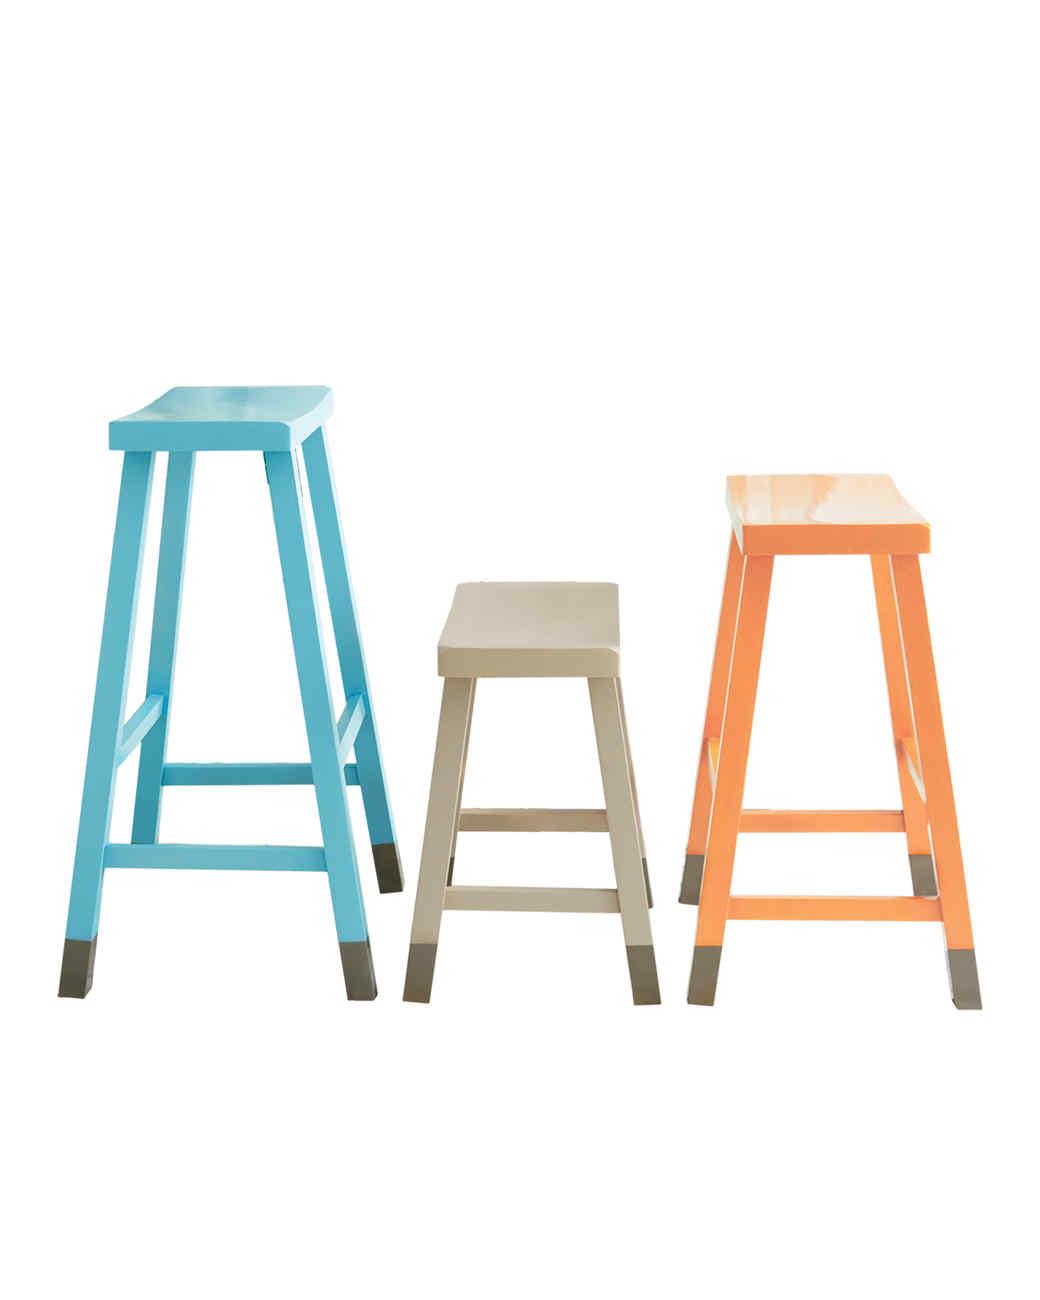 stools-finishing-touches-01-d106594-0815.jpg